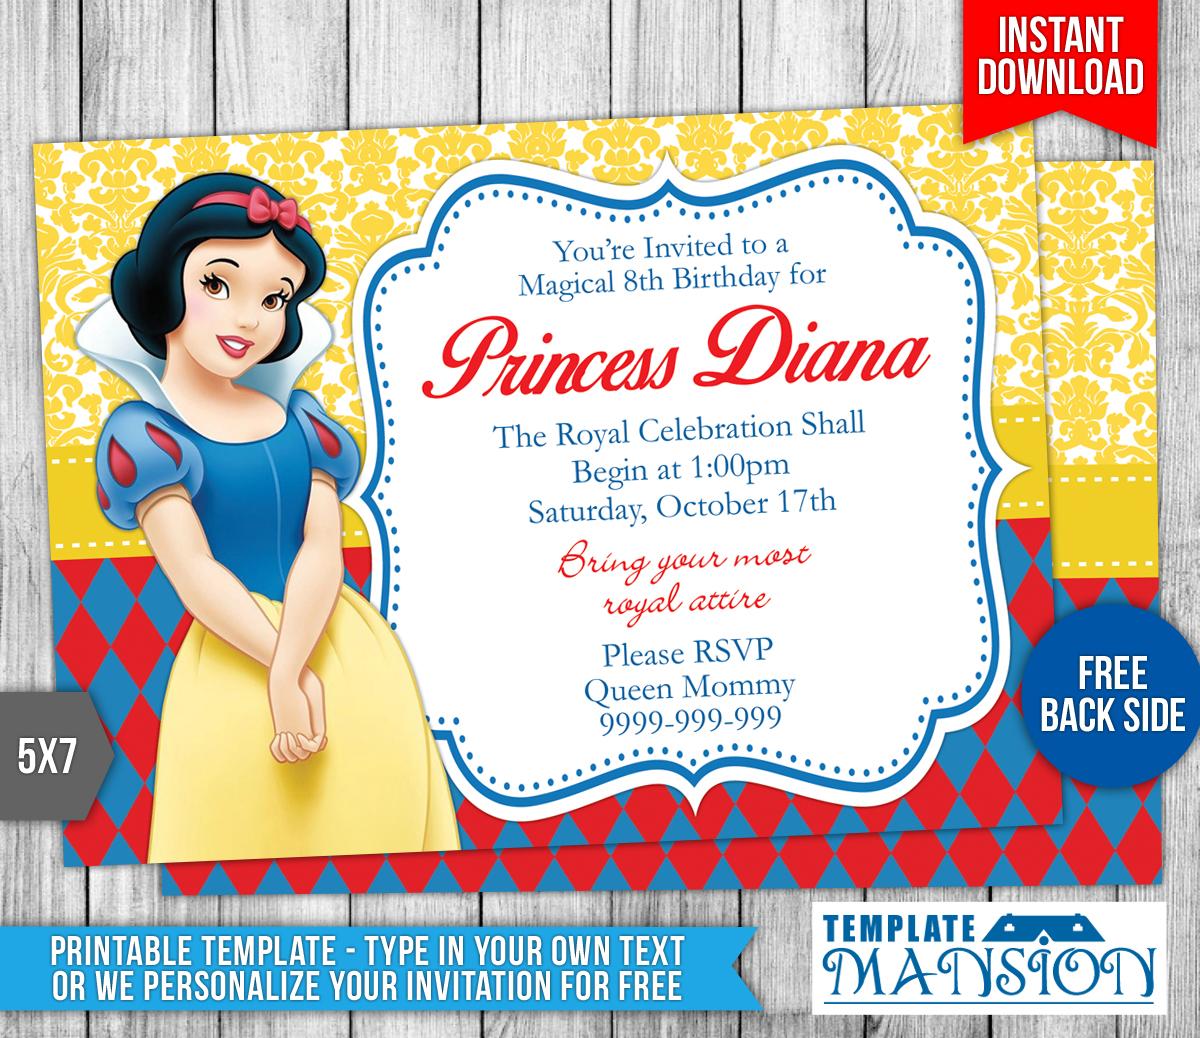 Snow White Birthday Invitation Template #3 by ...